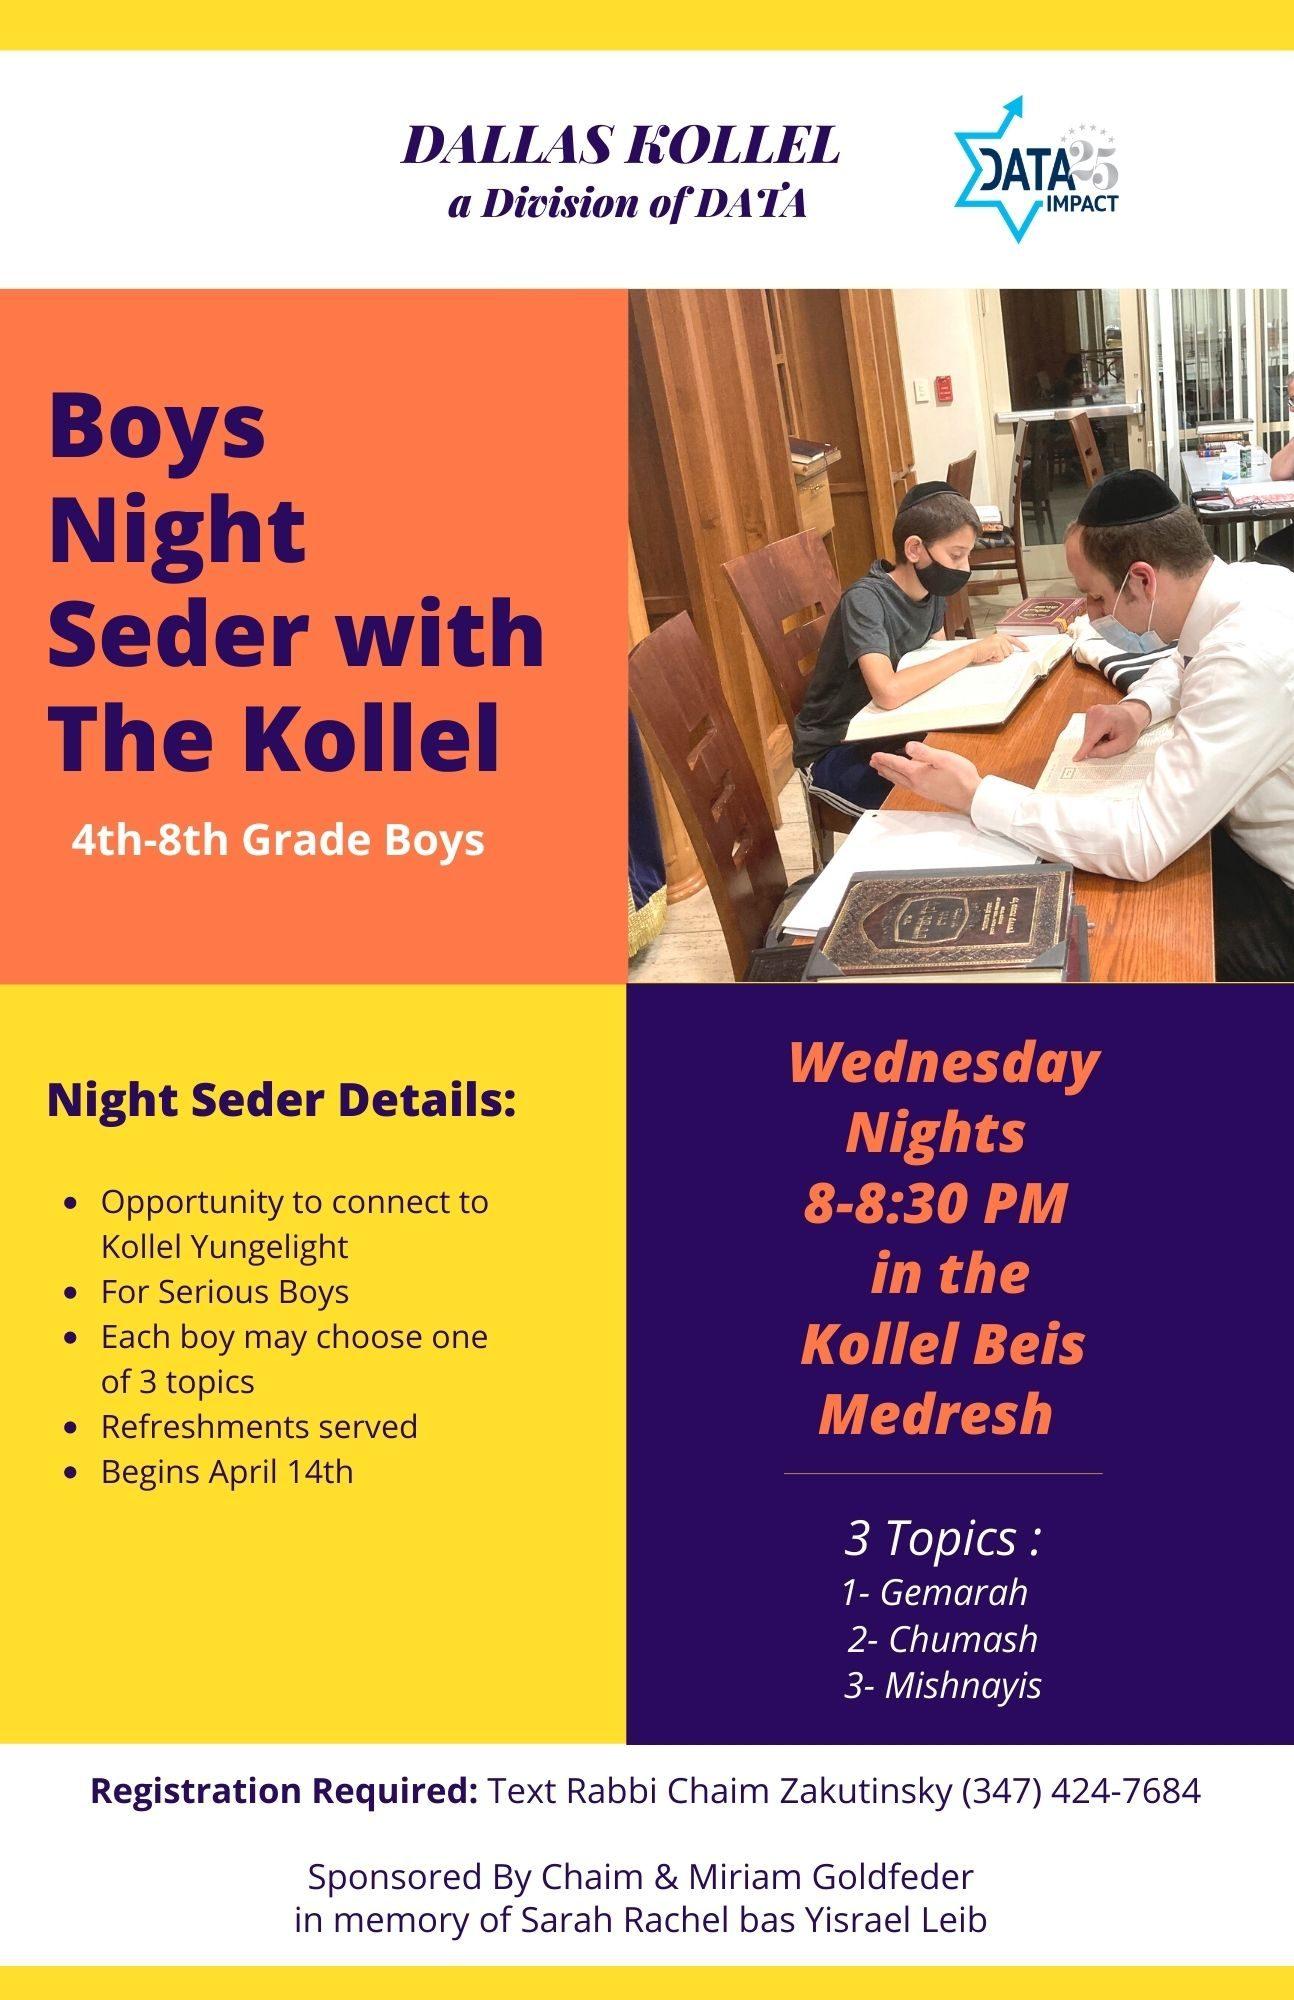 Boys Night Seder with the Kollel 1